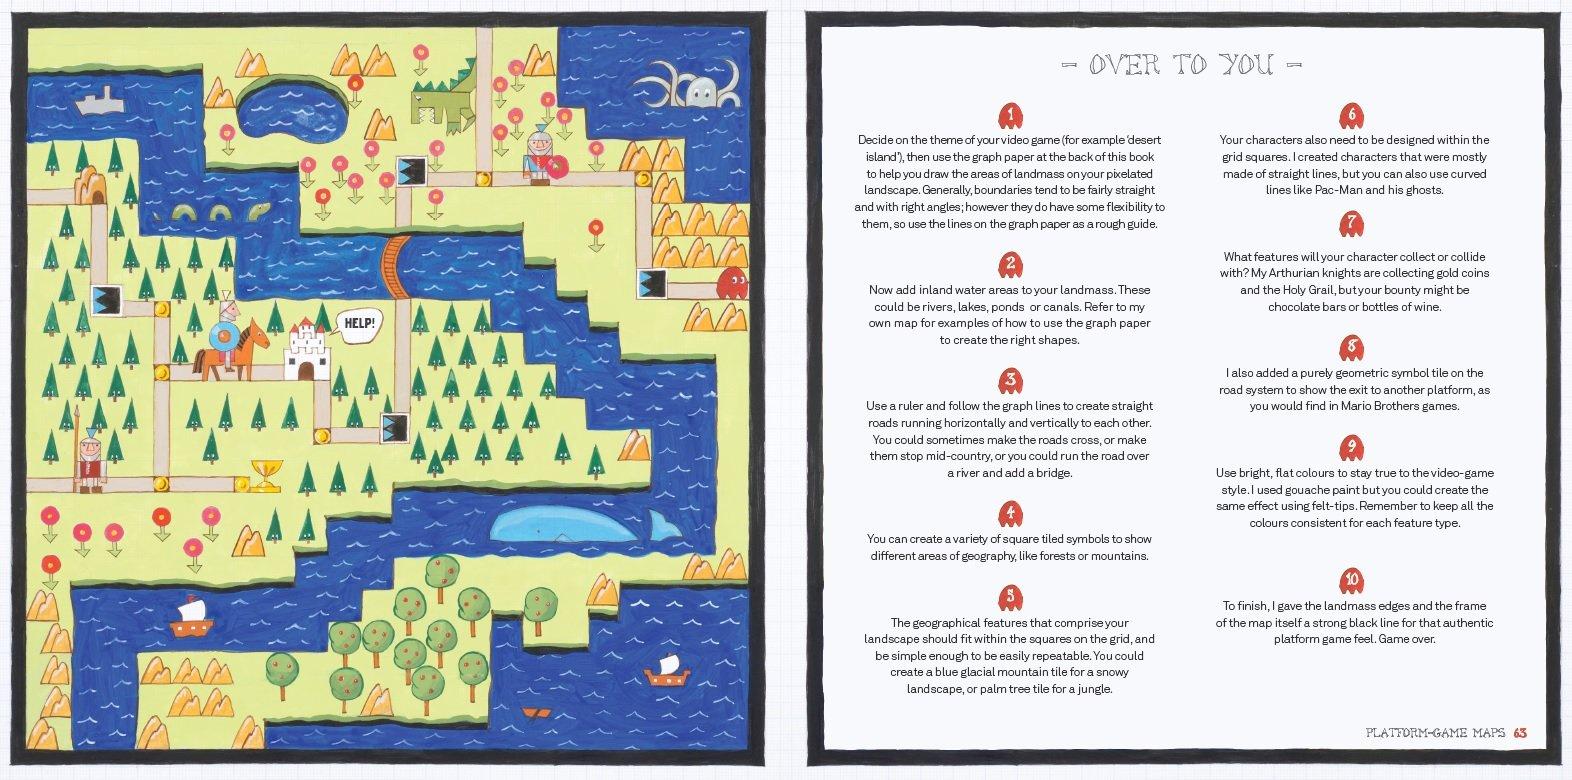 Hand-Drawn Maps: A Creator's Guide: Amazon.de: Helen Cann ... on